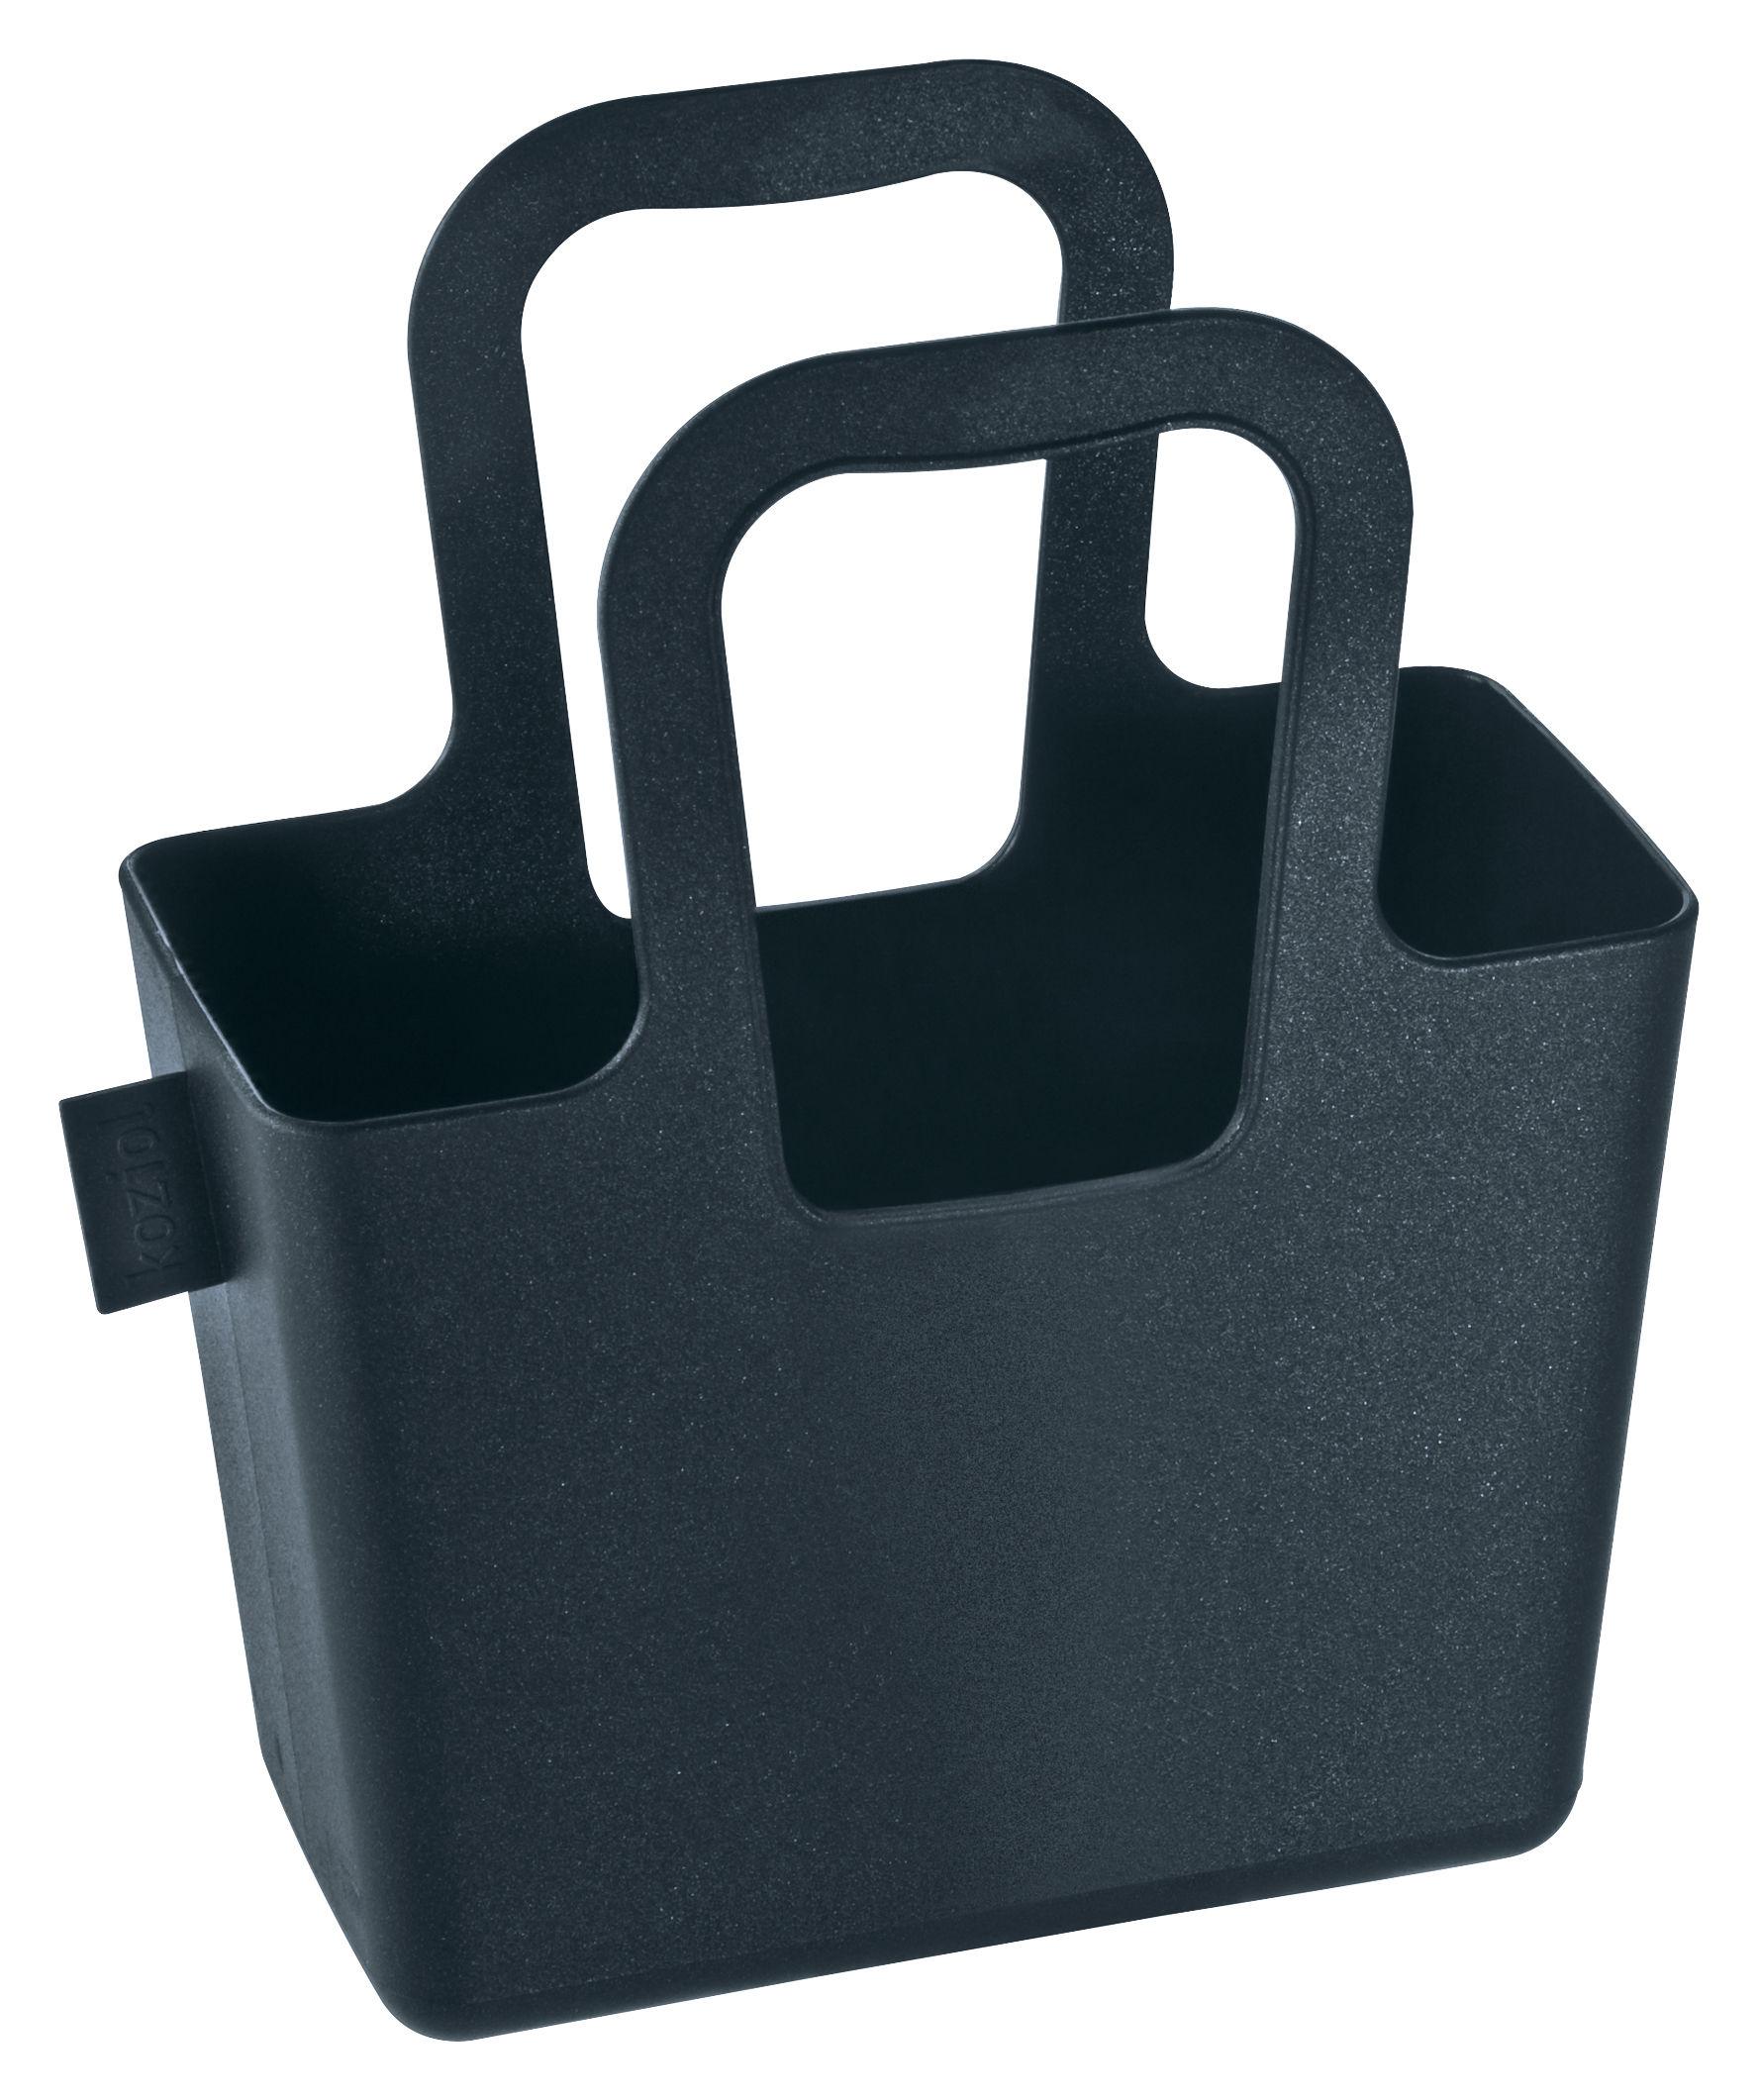 Decoration - For bathroom - Taschelini Basket by Koziol - Black - Plastic material